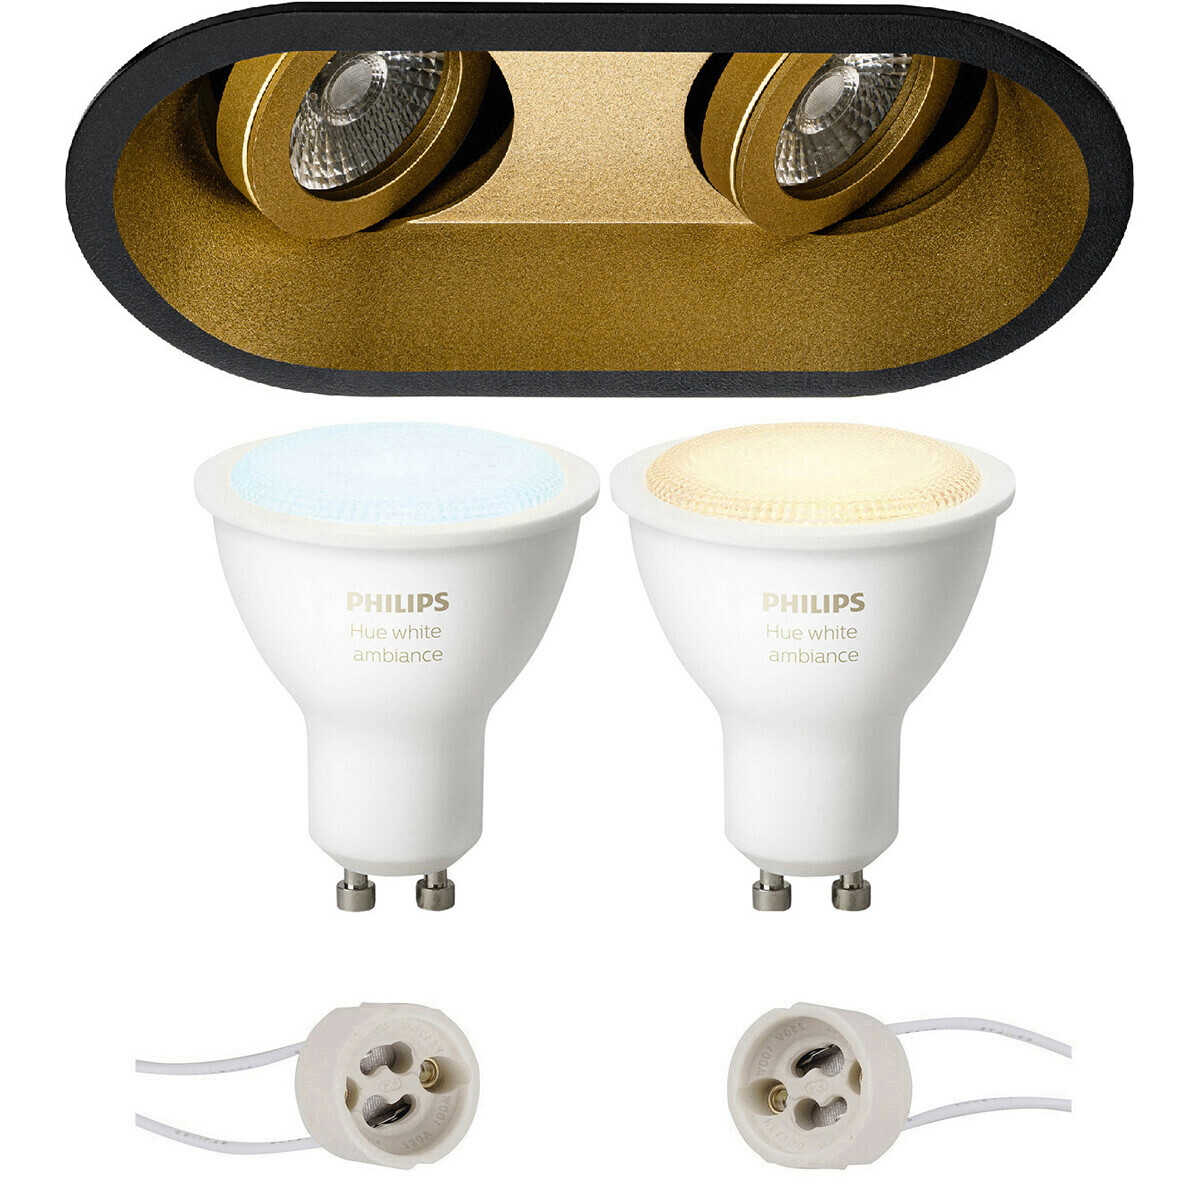 Pragmi Zano Pro - Inbouw Ovaal Dubbel - Mat Zwart/Goud - Kantelbaar - 185x93mm - Philips Hue - LED S